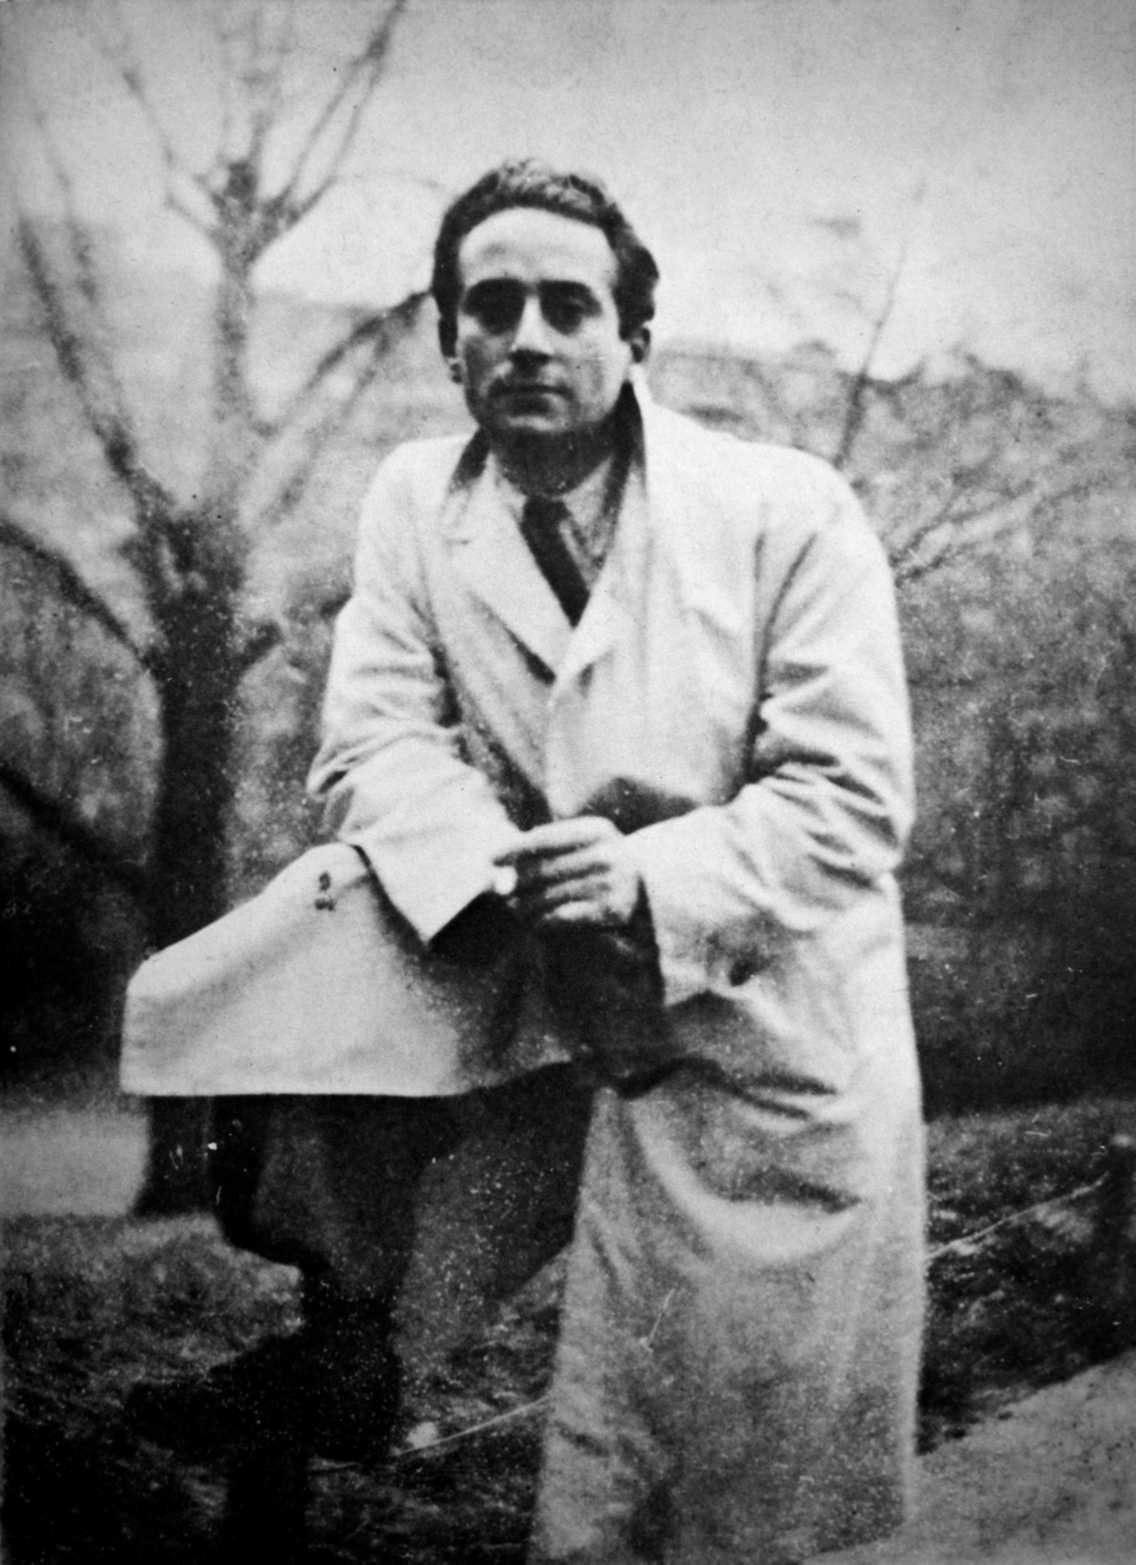 L'última fotografia de Wenceslao Jiménez Orive (París, desembre de 1949)